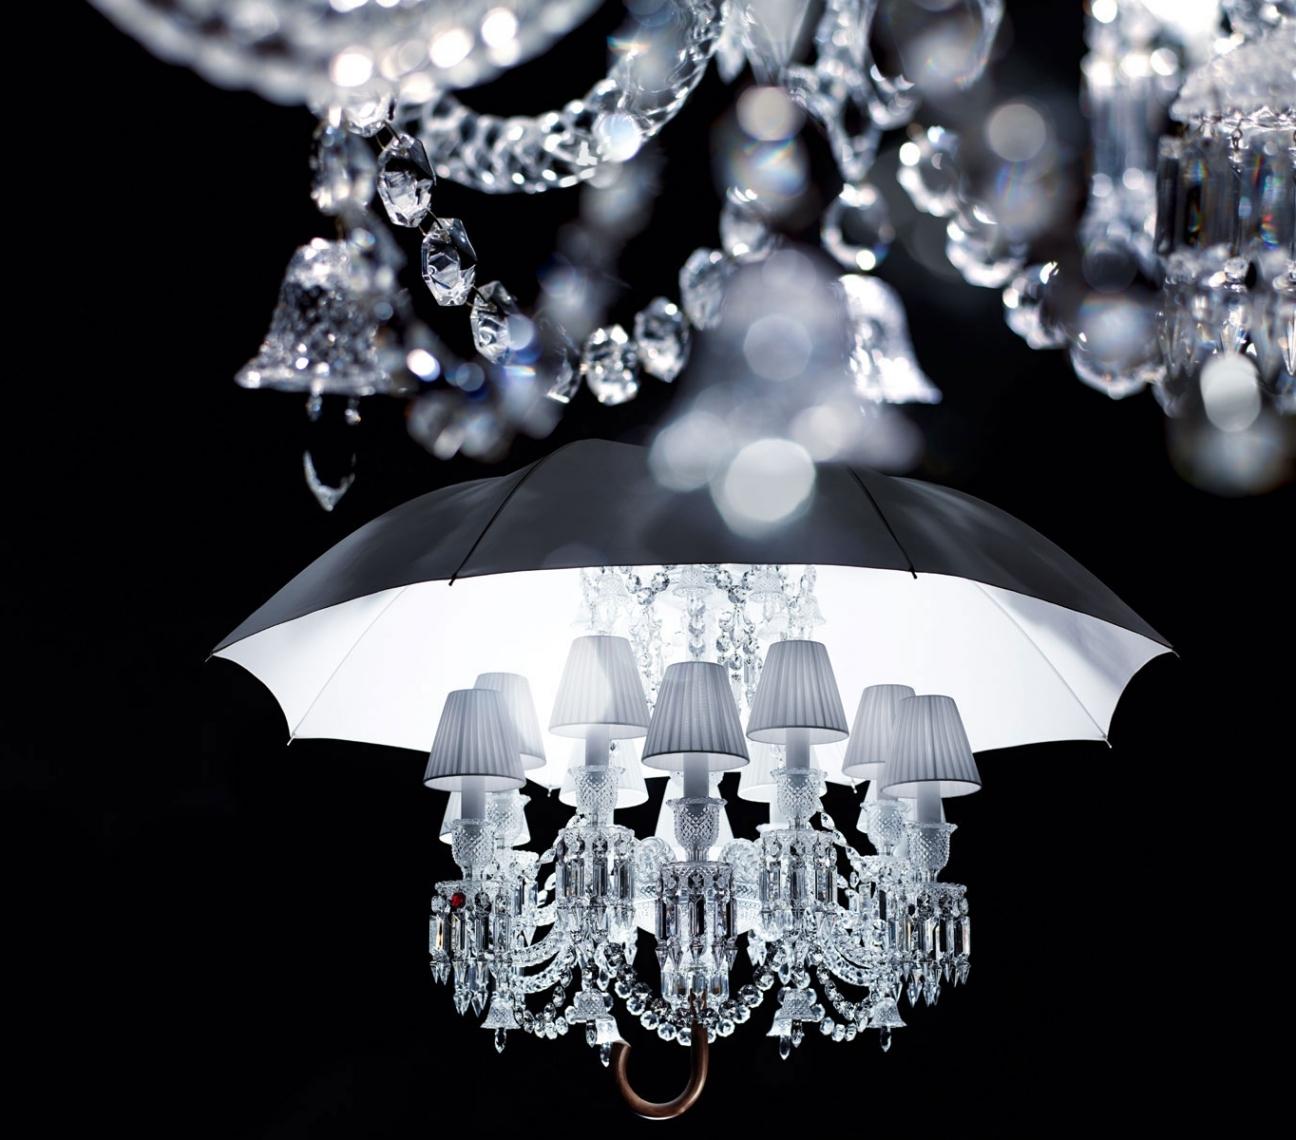 Baccarat Marie Coquine Chandelier, 12 Light Inside Chandelier With An Umbrella